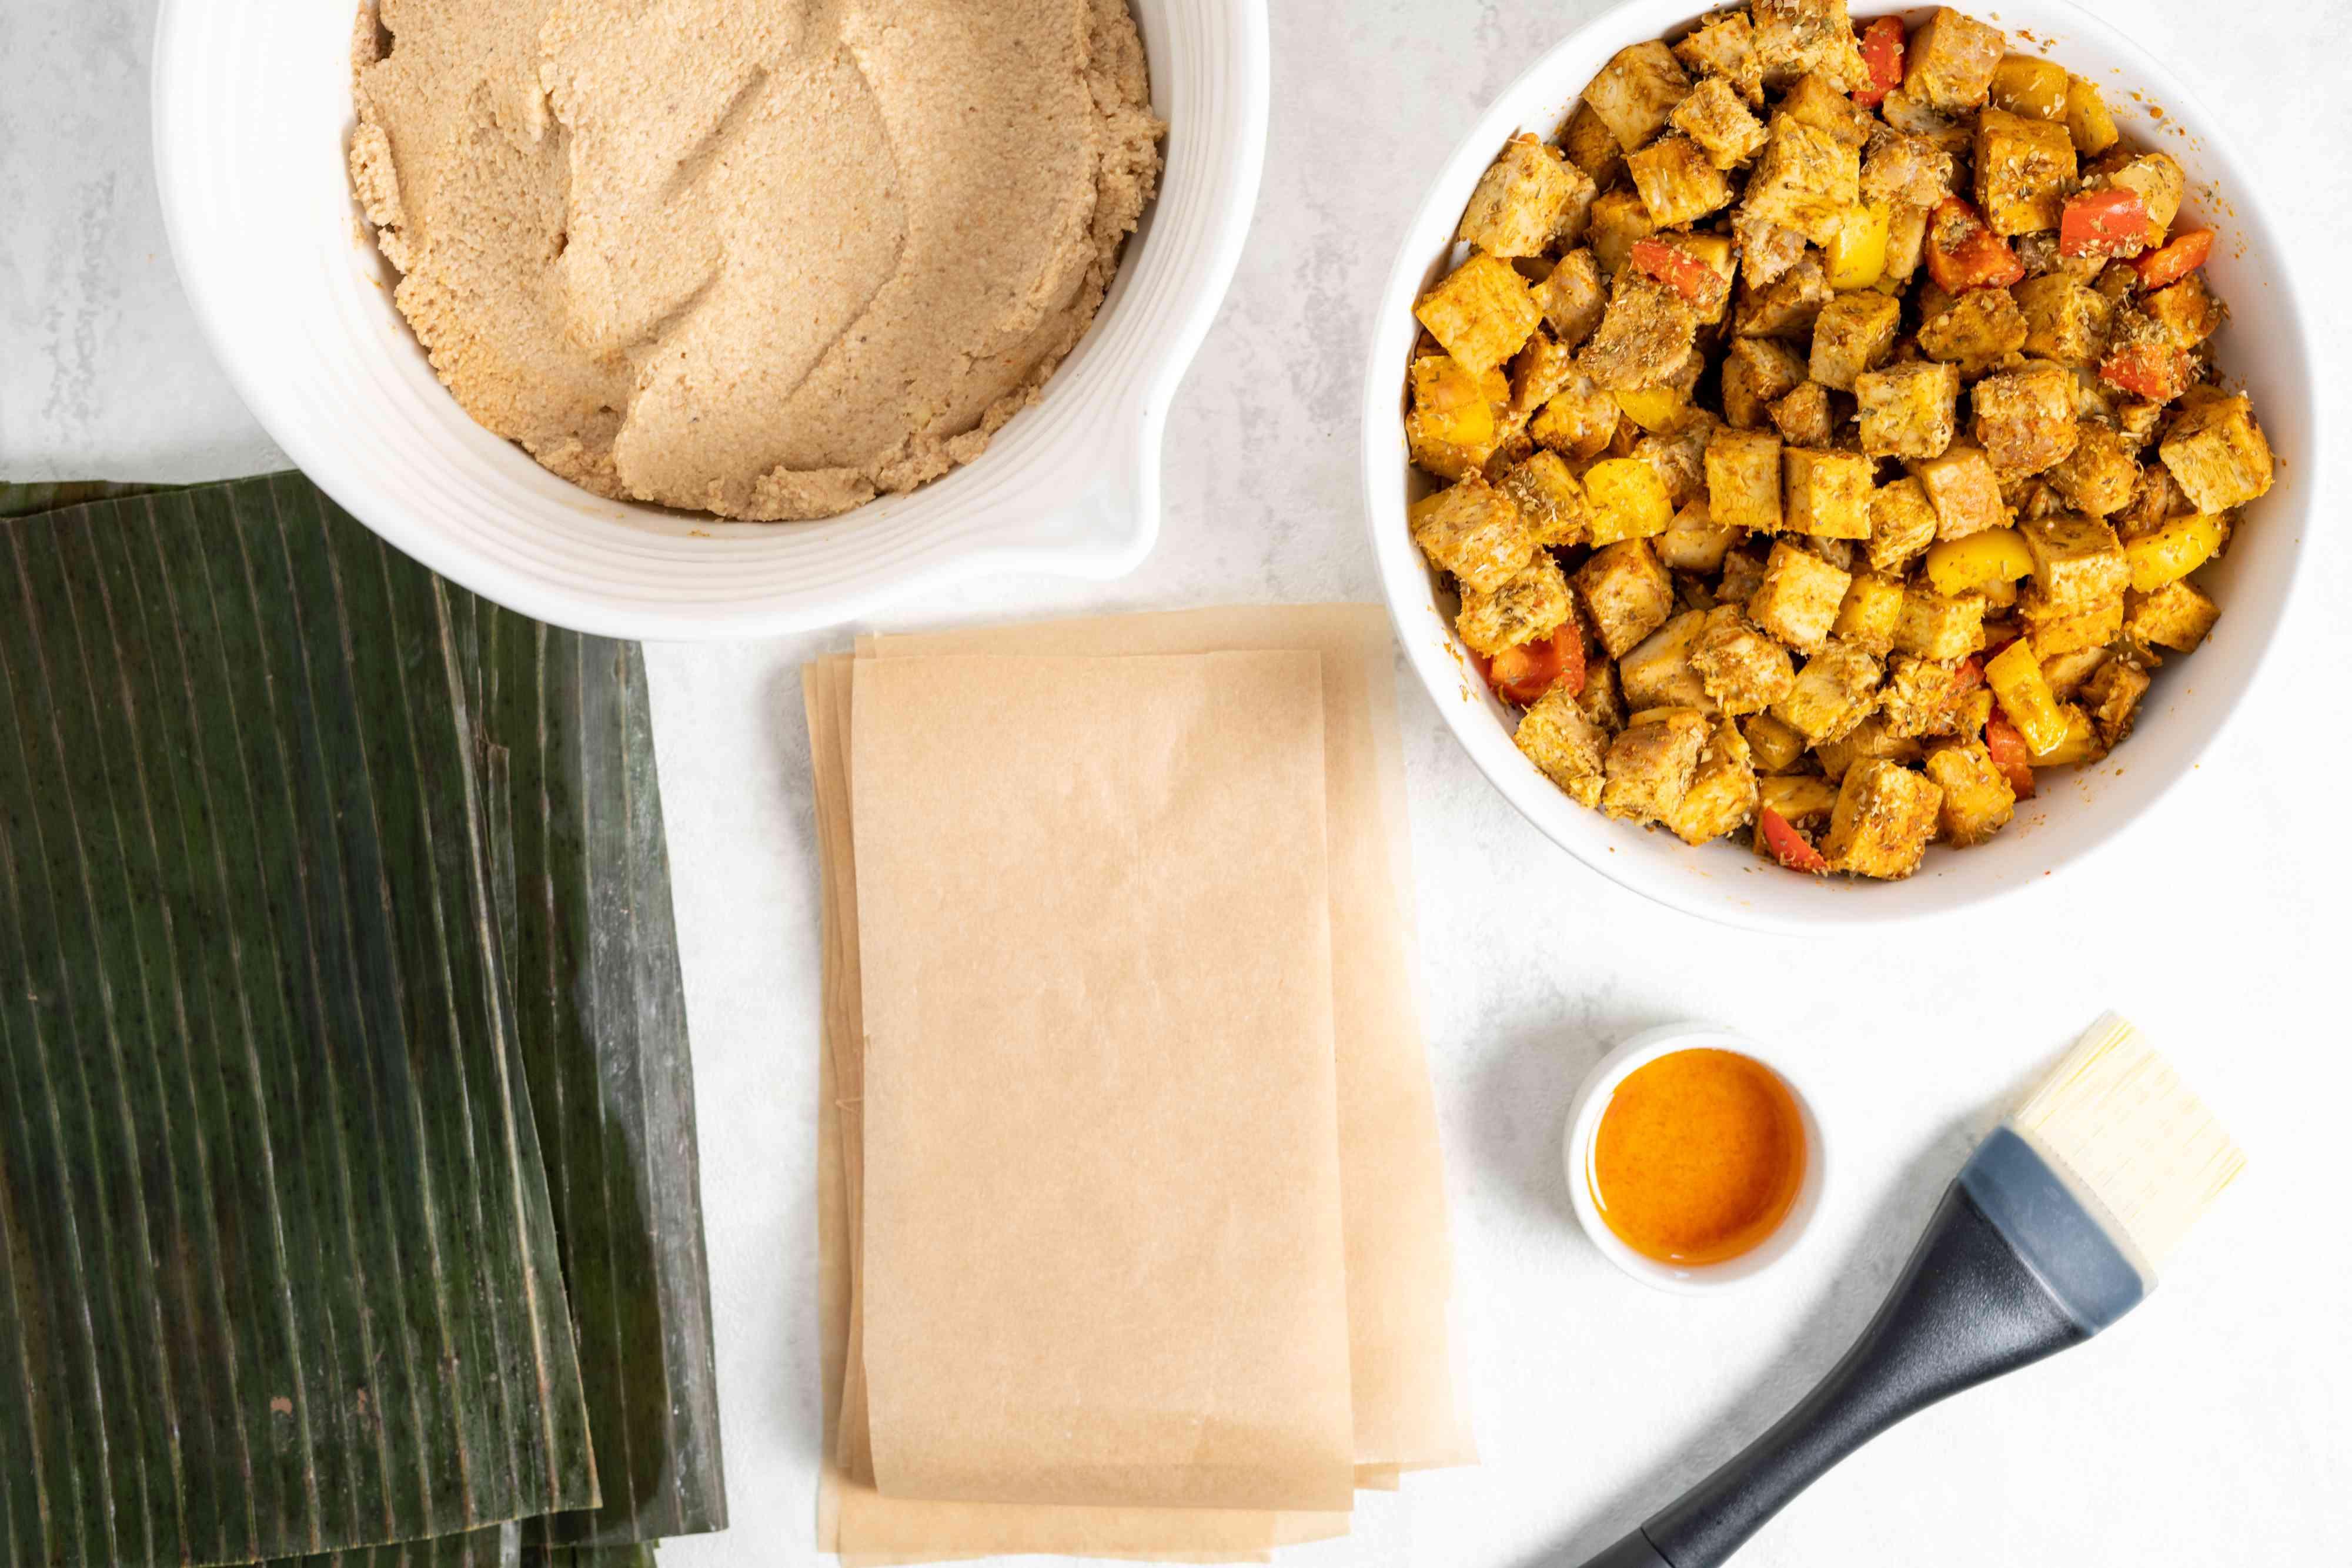 Puerto Rican Pasteles ingredients